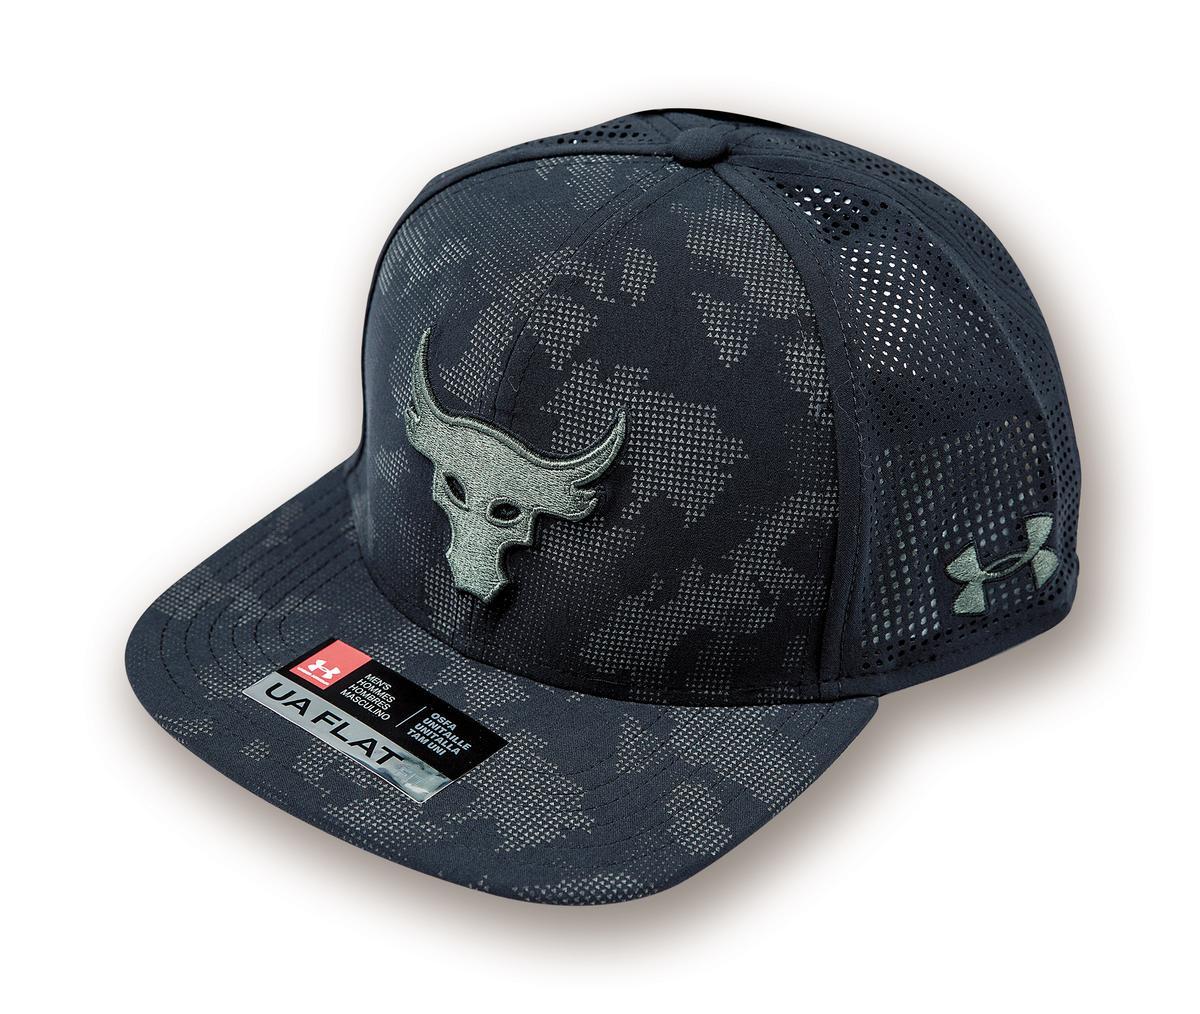 UNDER ARMOUR棒球帽,約NT$2,000。